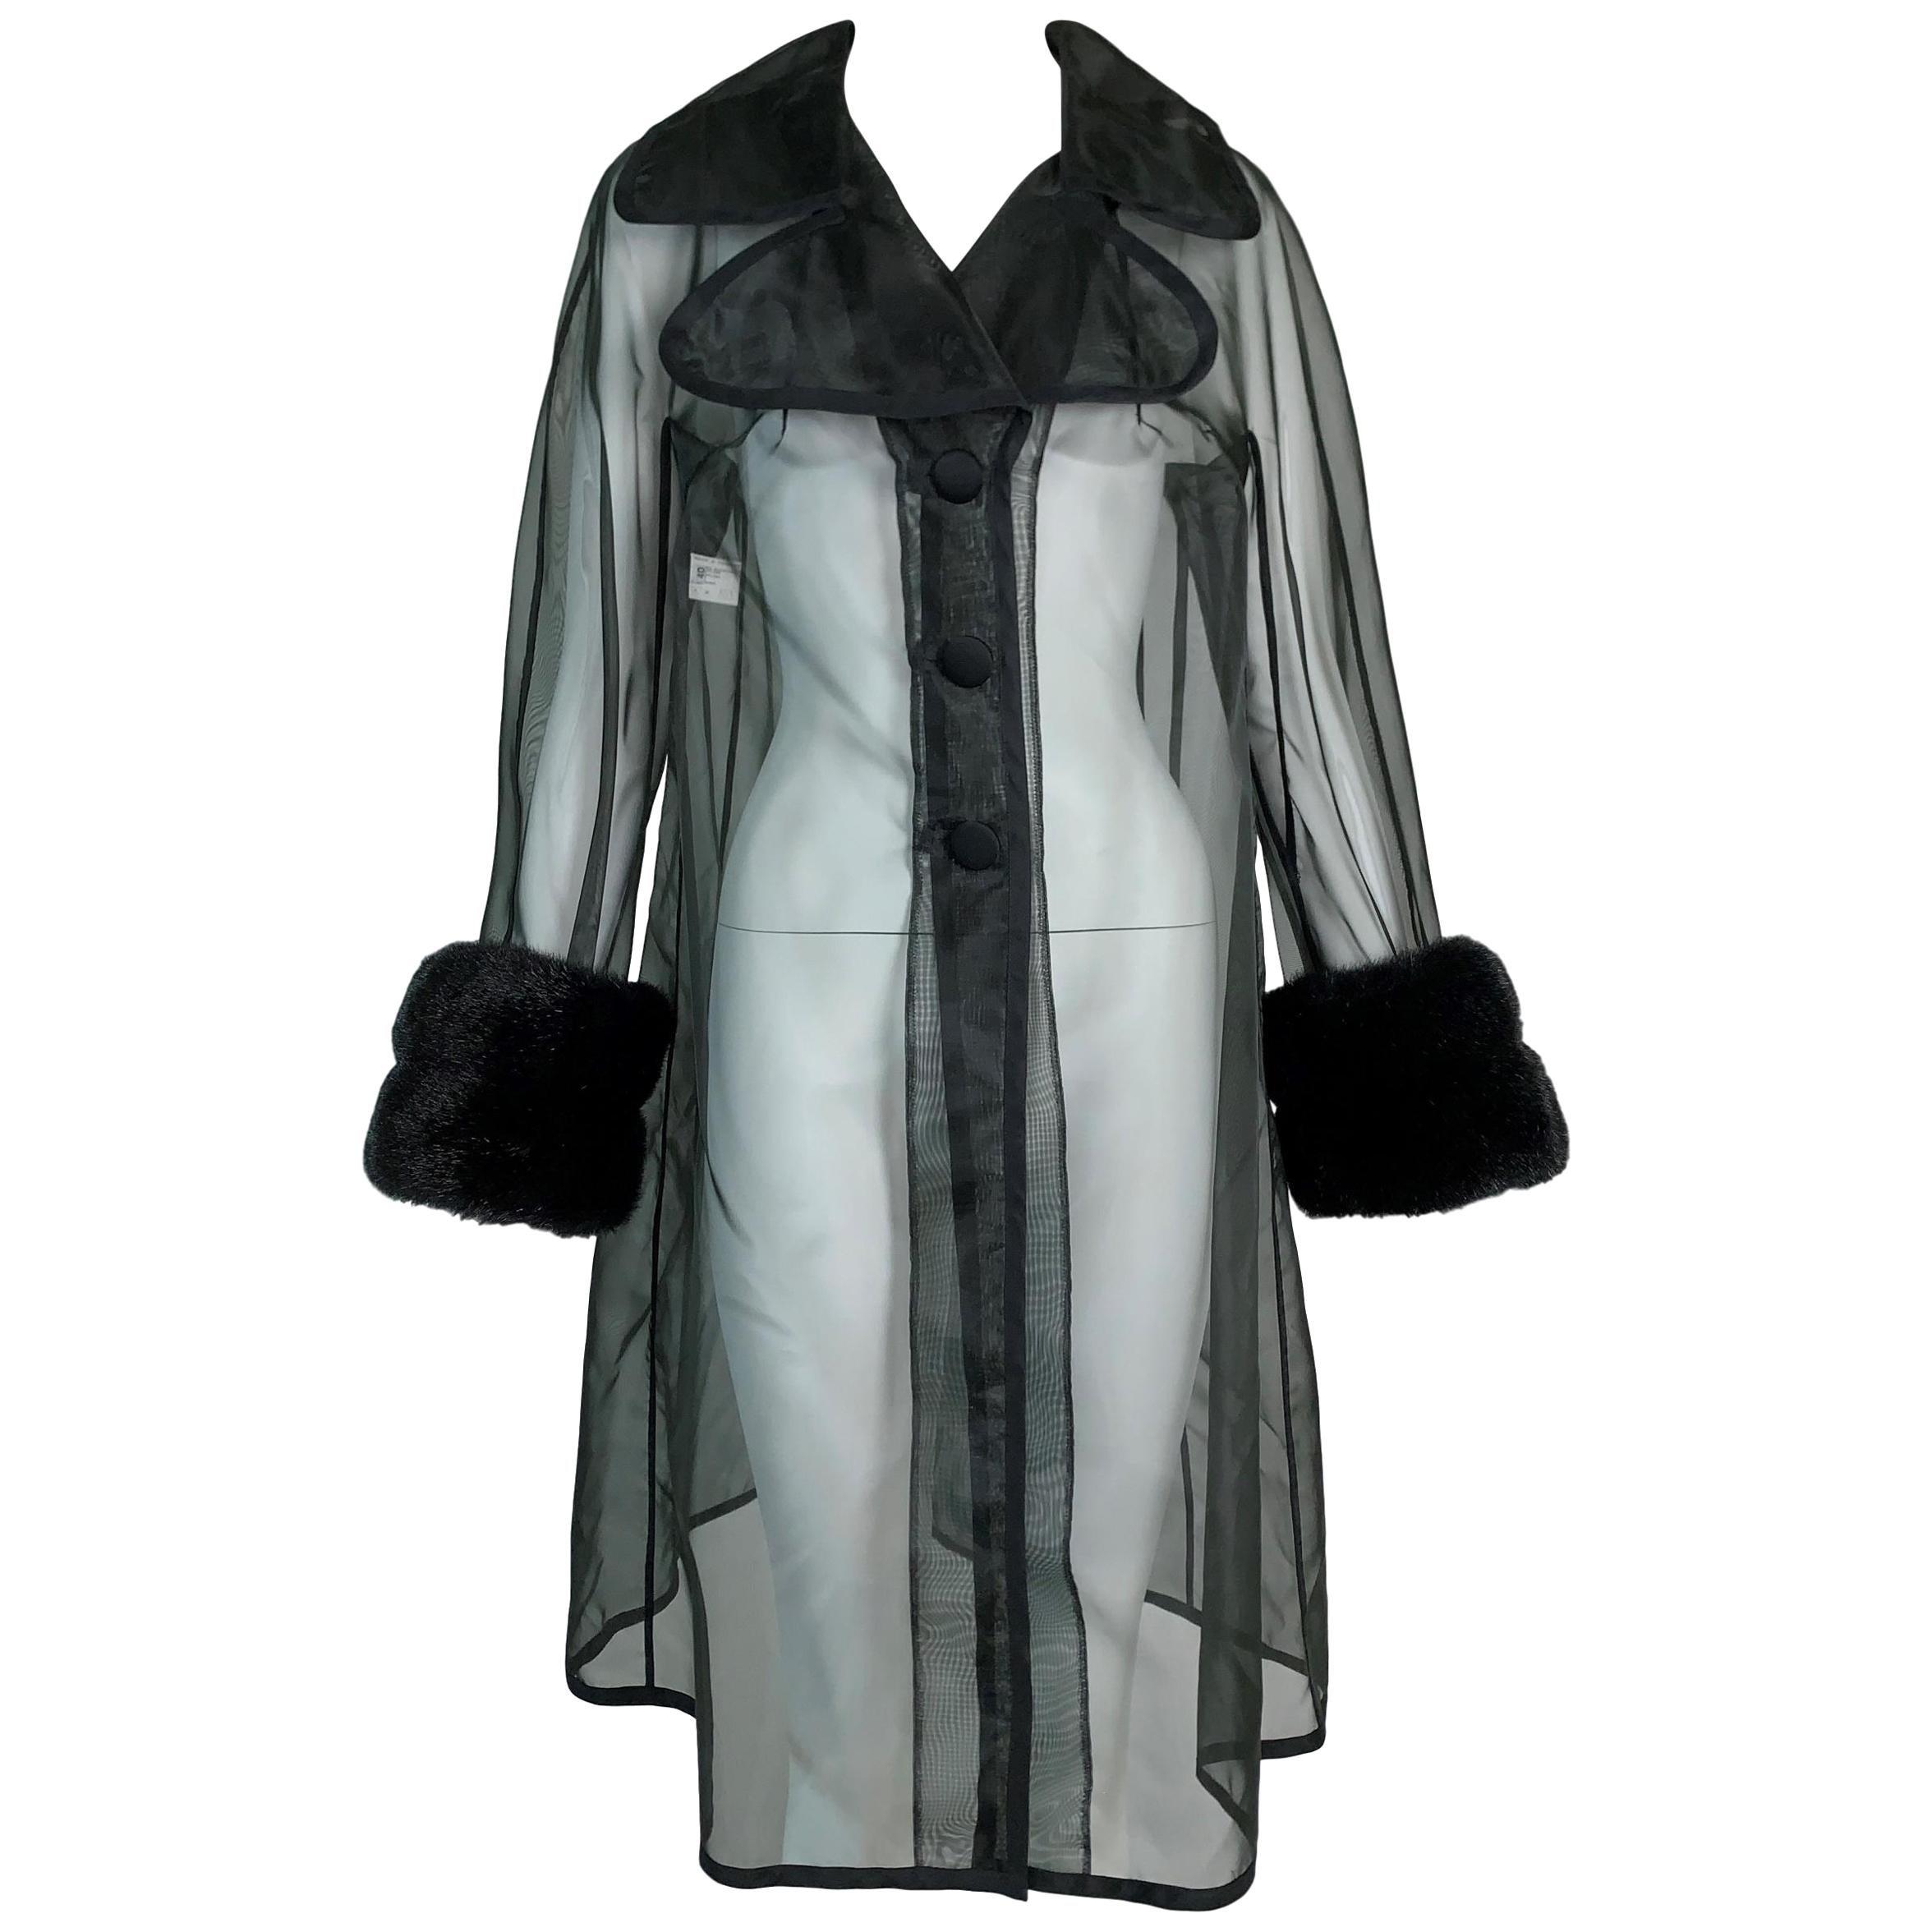 S/S 1995 Dolce & Gabbana Sheer Black 1950's Style A-Line Faux Fur Jacket